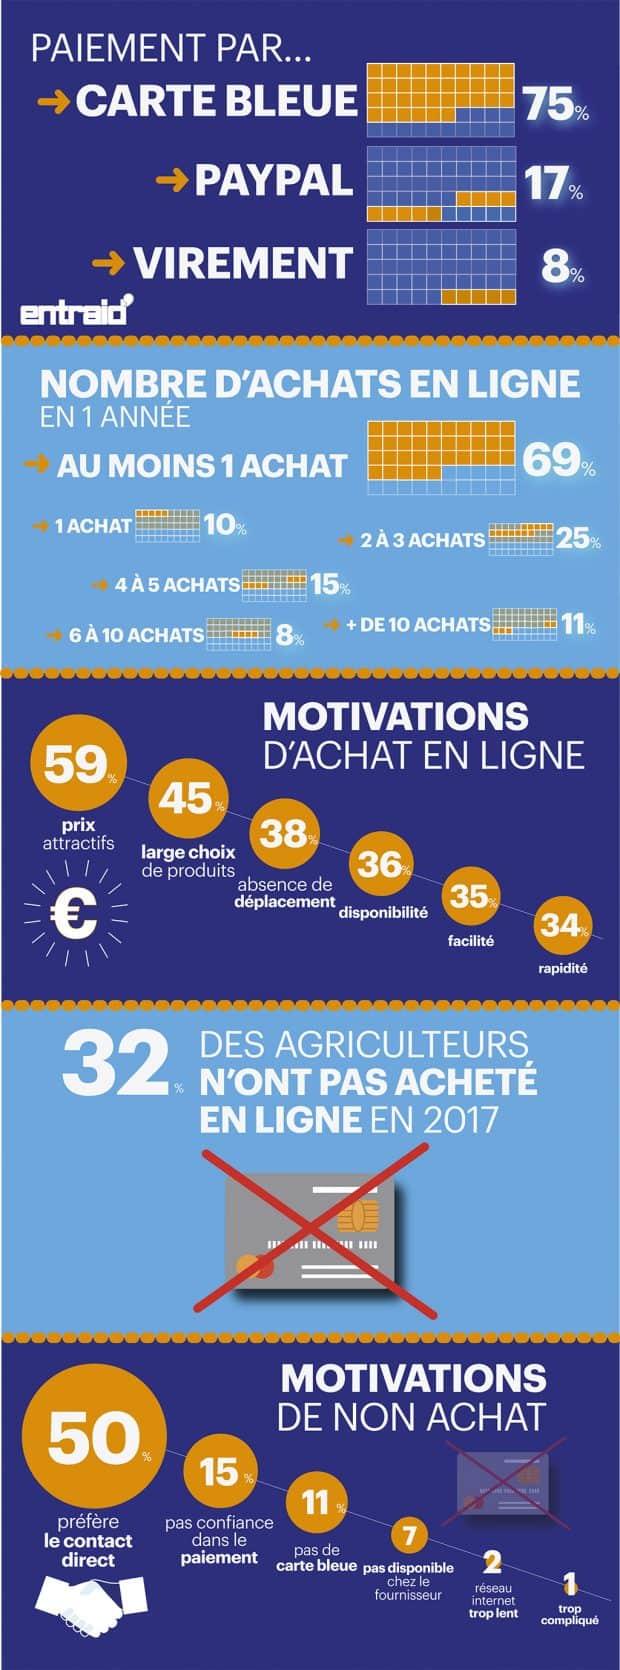 e-commerce agricole